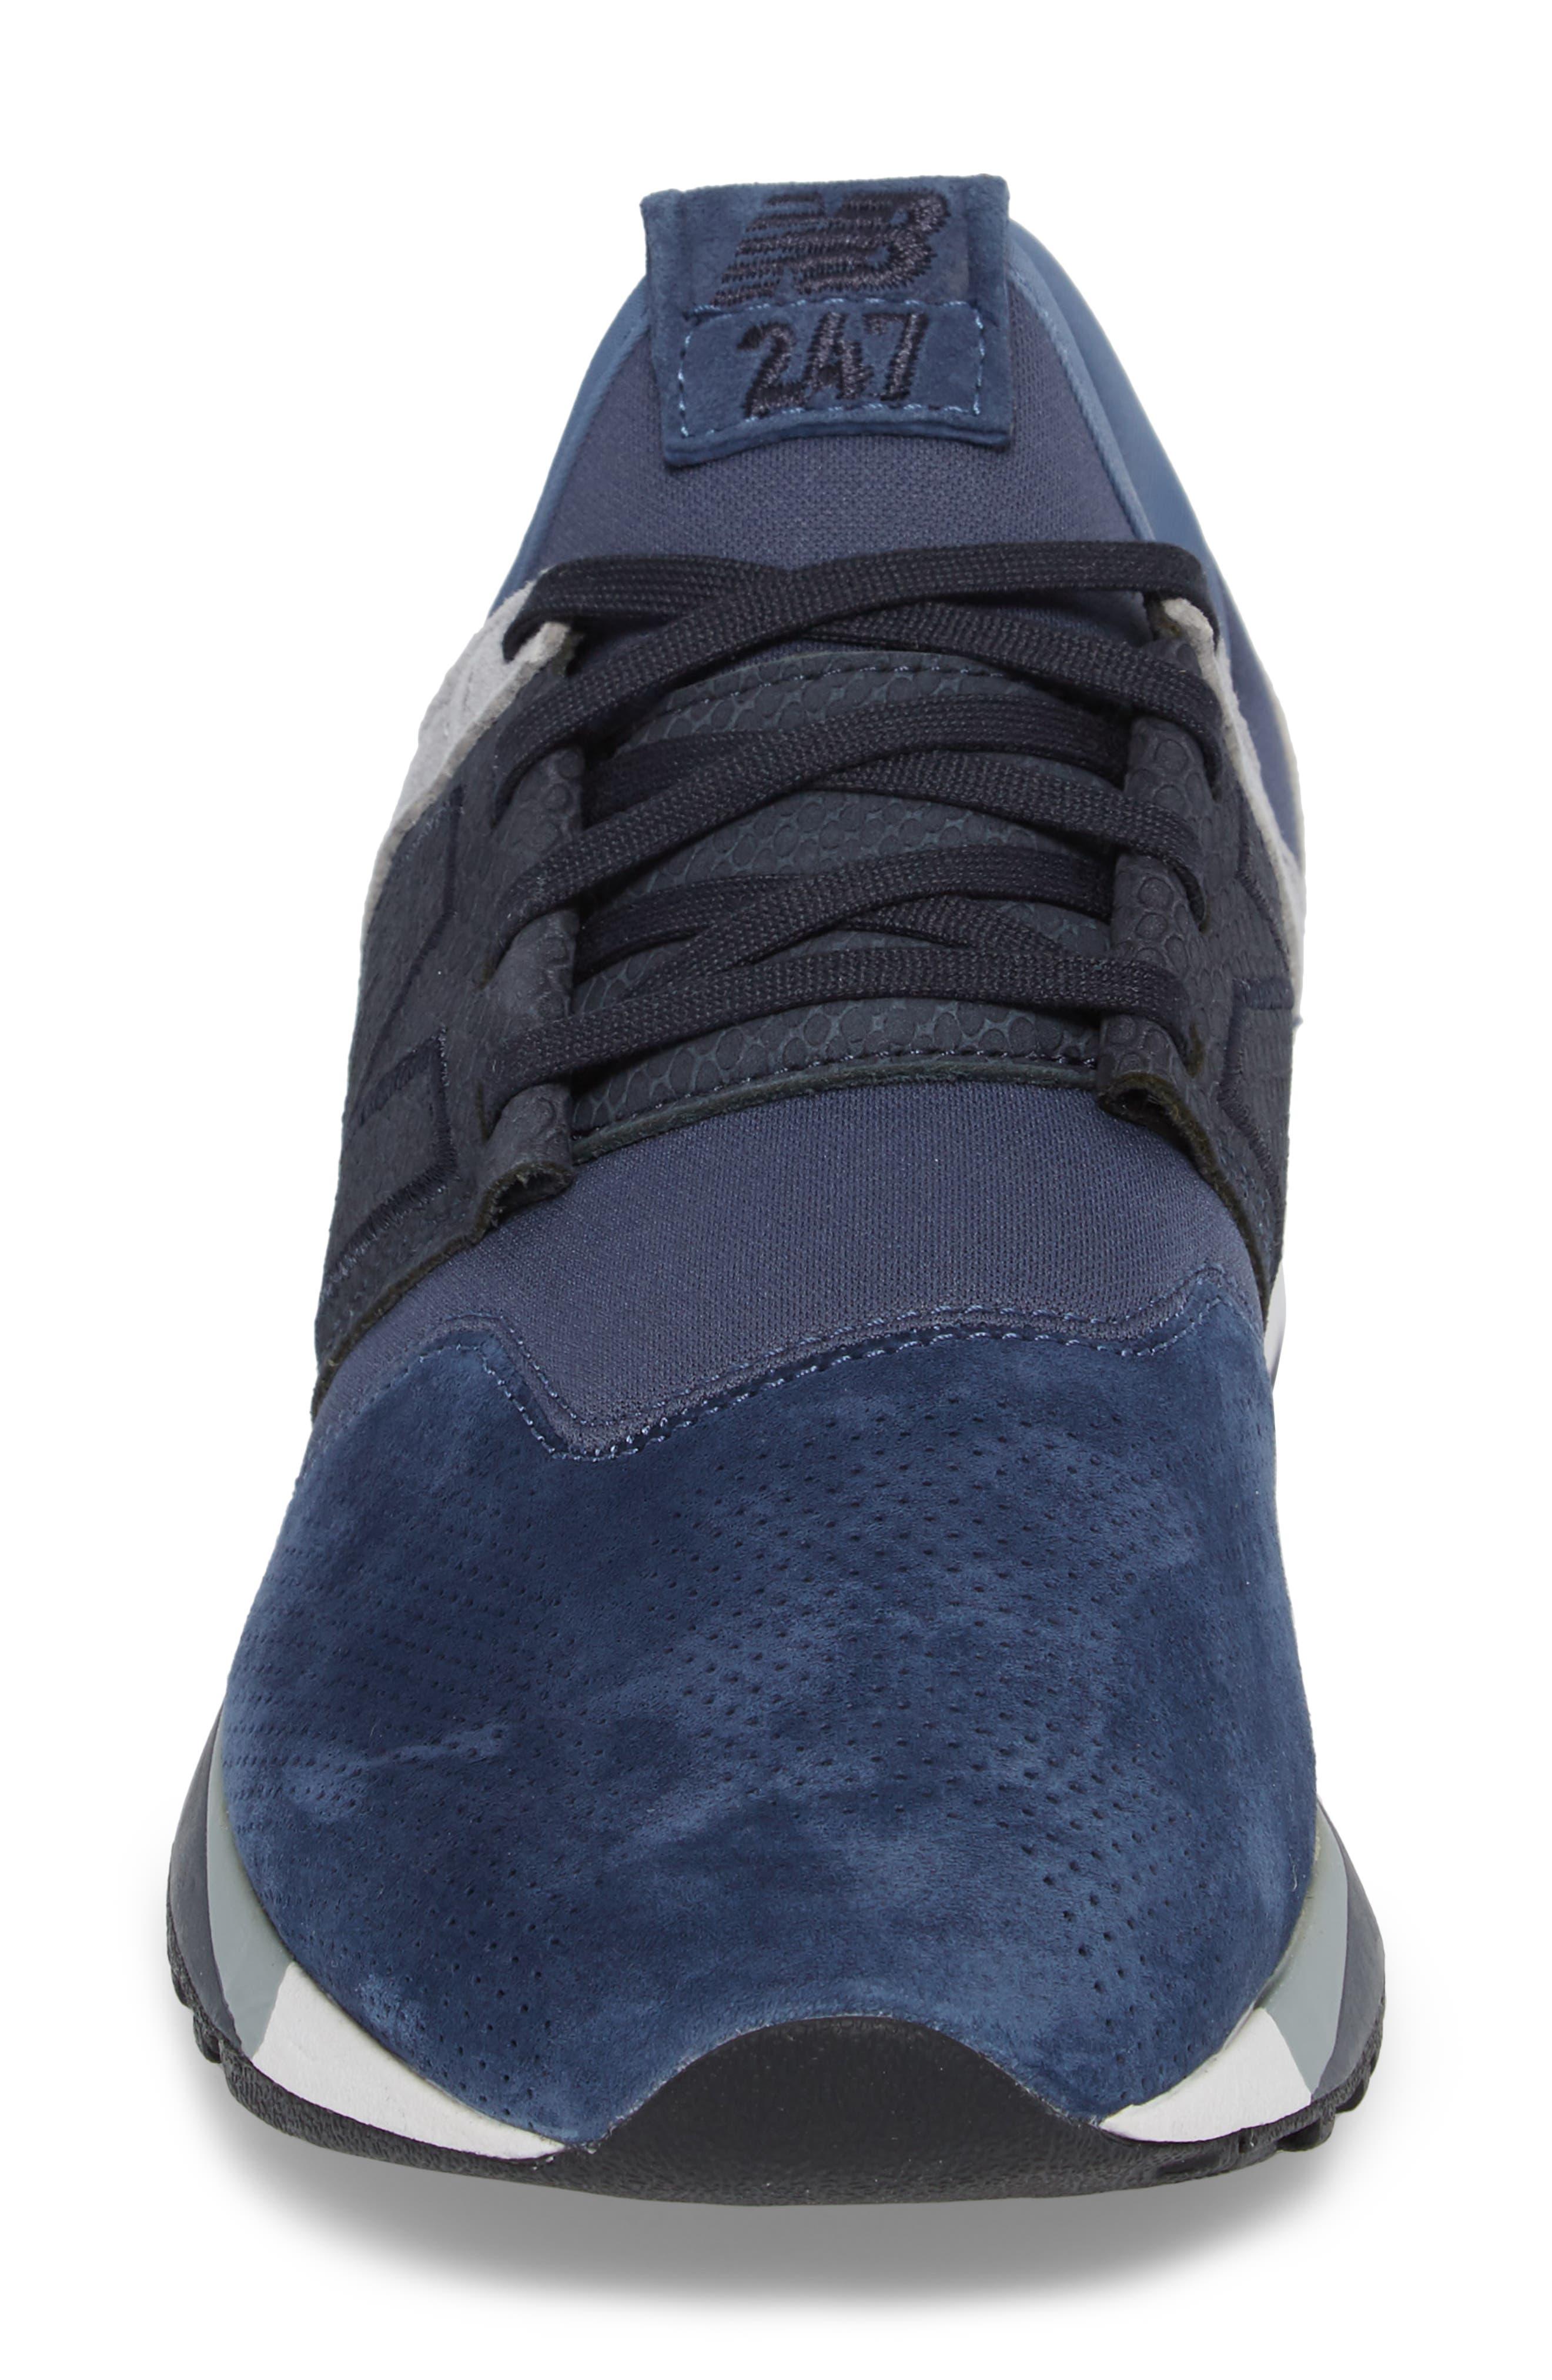 247 Luxe Sneaker,                             Alternate thumbnail 4, color,                             Blue